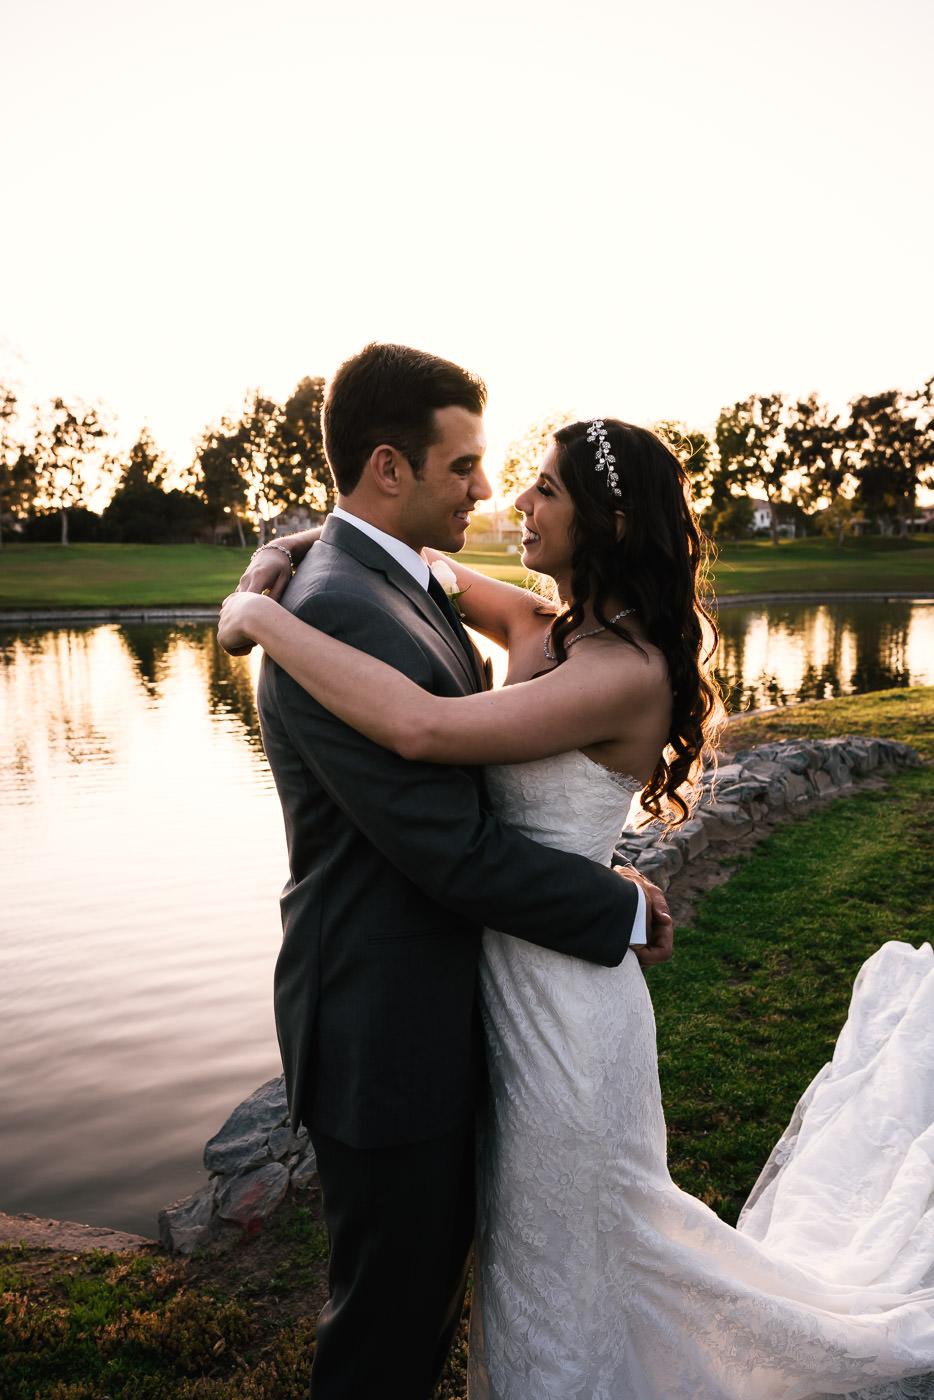 Placentia's best wedding photographers.